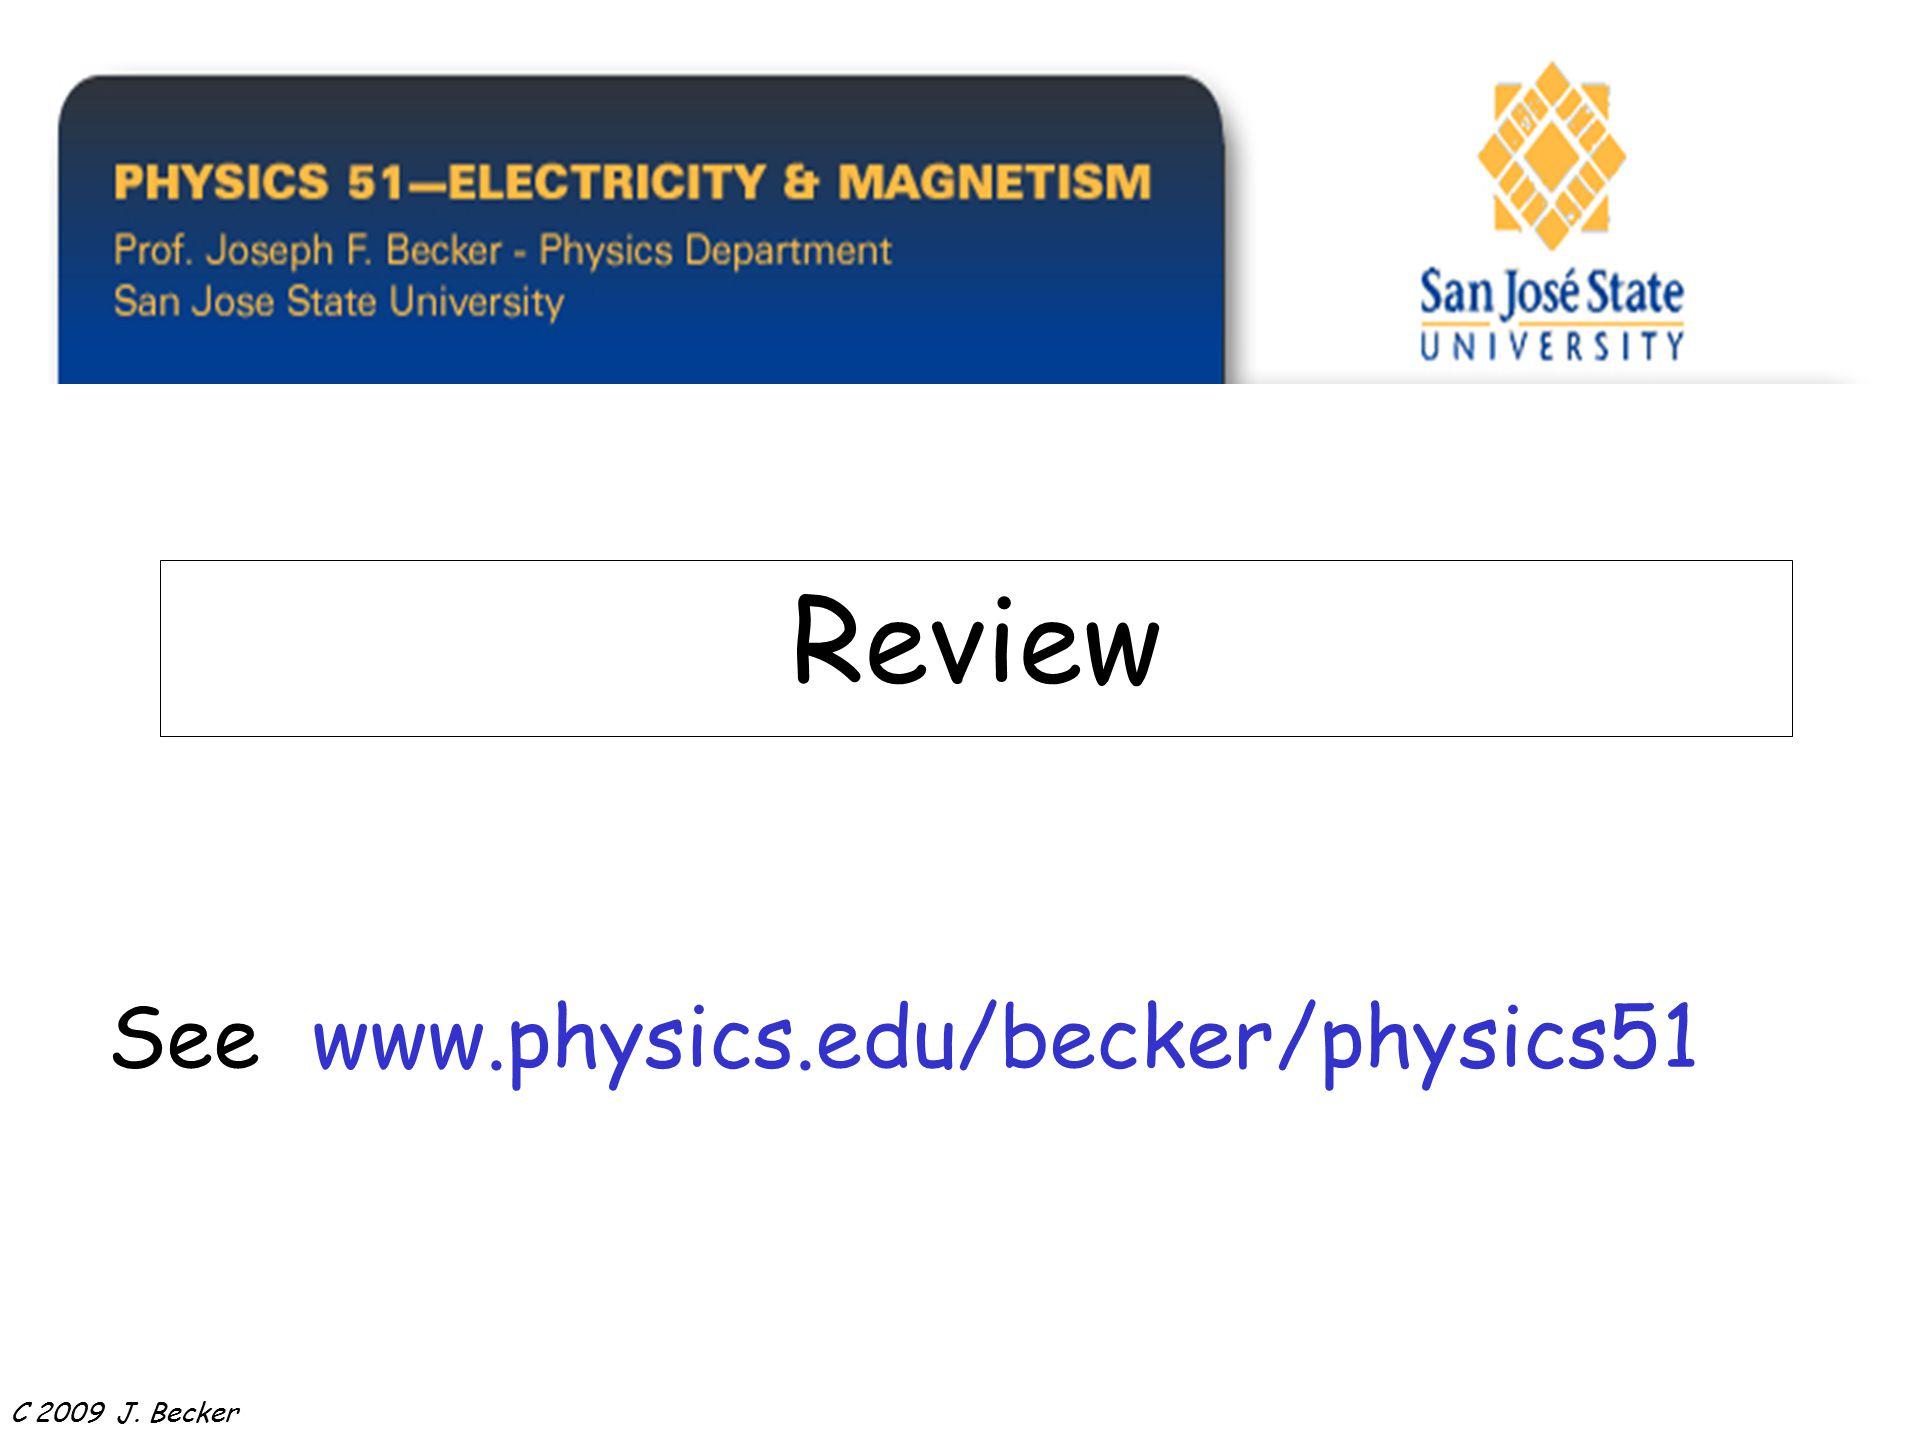 OVERVIEW Review See www.physics.edu/becker/physics51 C 2009 J. Becker